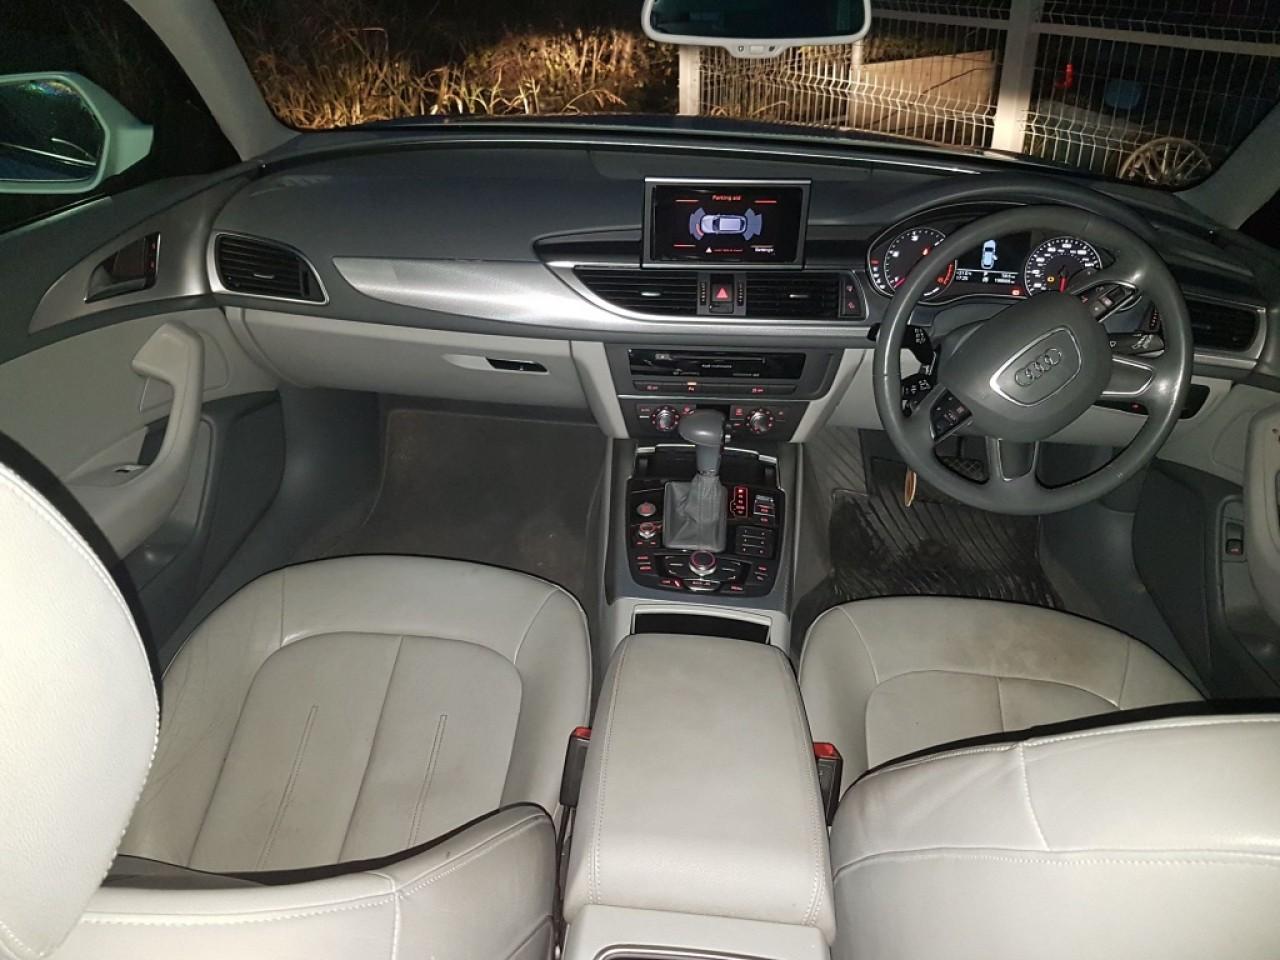 Turbina Audi A6 4G C7 2012 variant 2.0 tdi